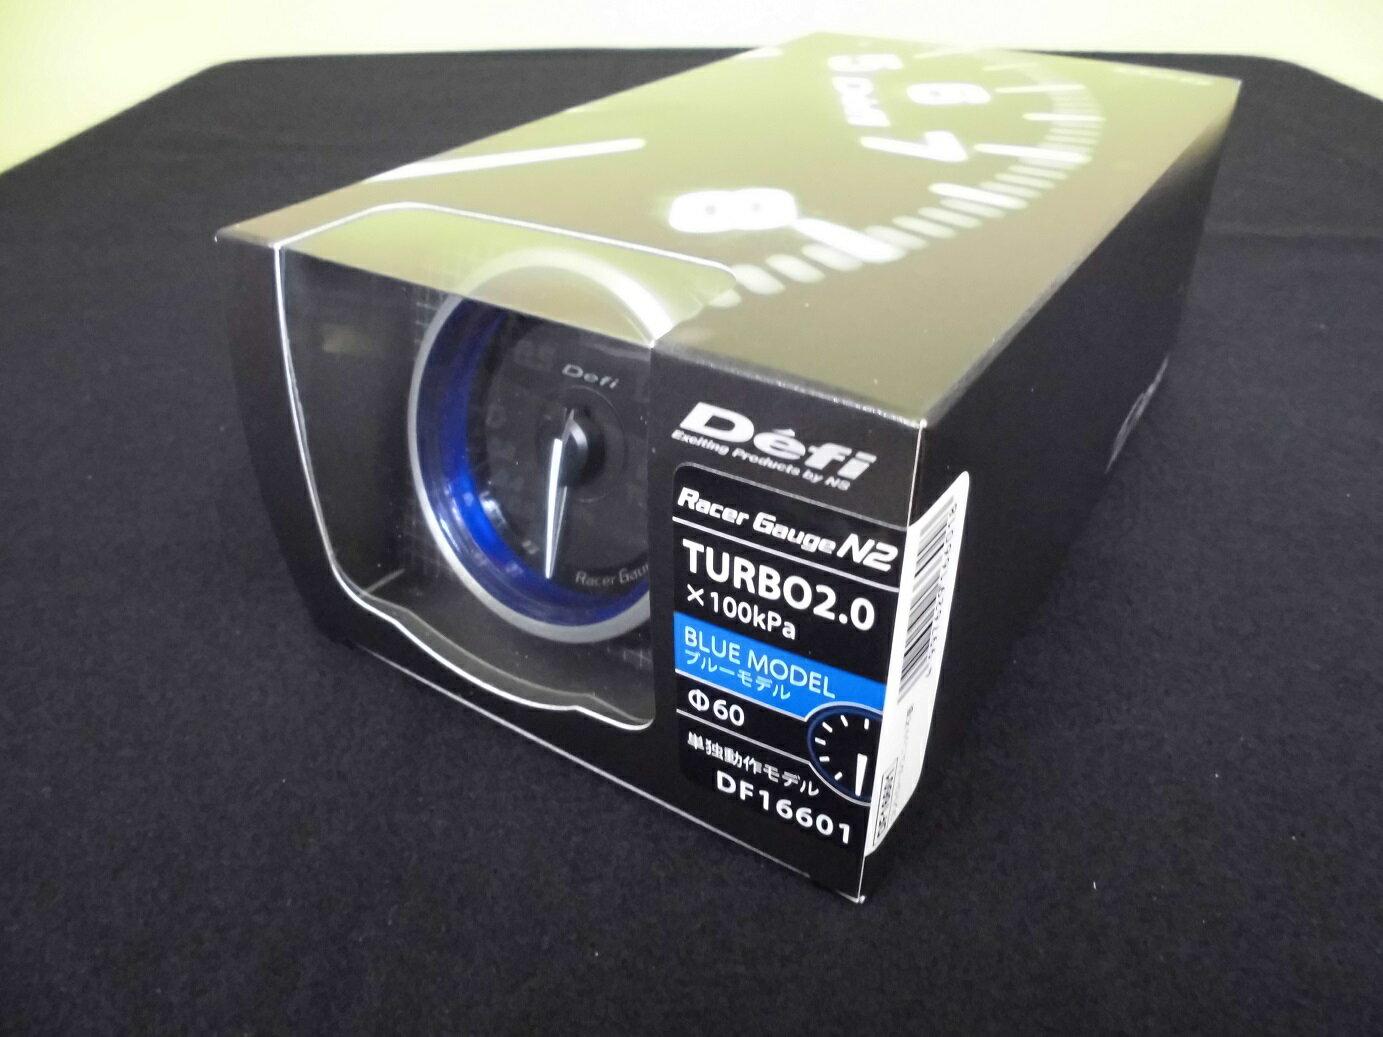 Defi Racer Gauge N2 デフィ レーサーゲージ 60Φ ターボ計 (ブースト計) MAX表示200KPA DF16601 「送料無料!!」